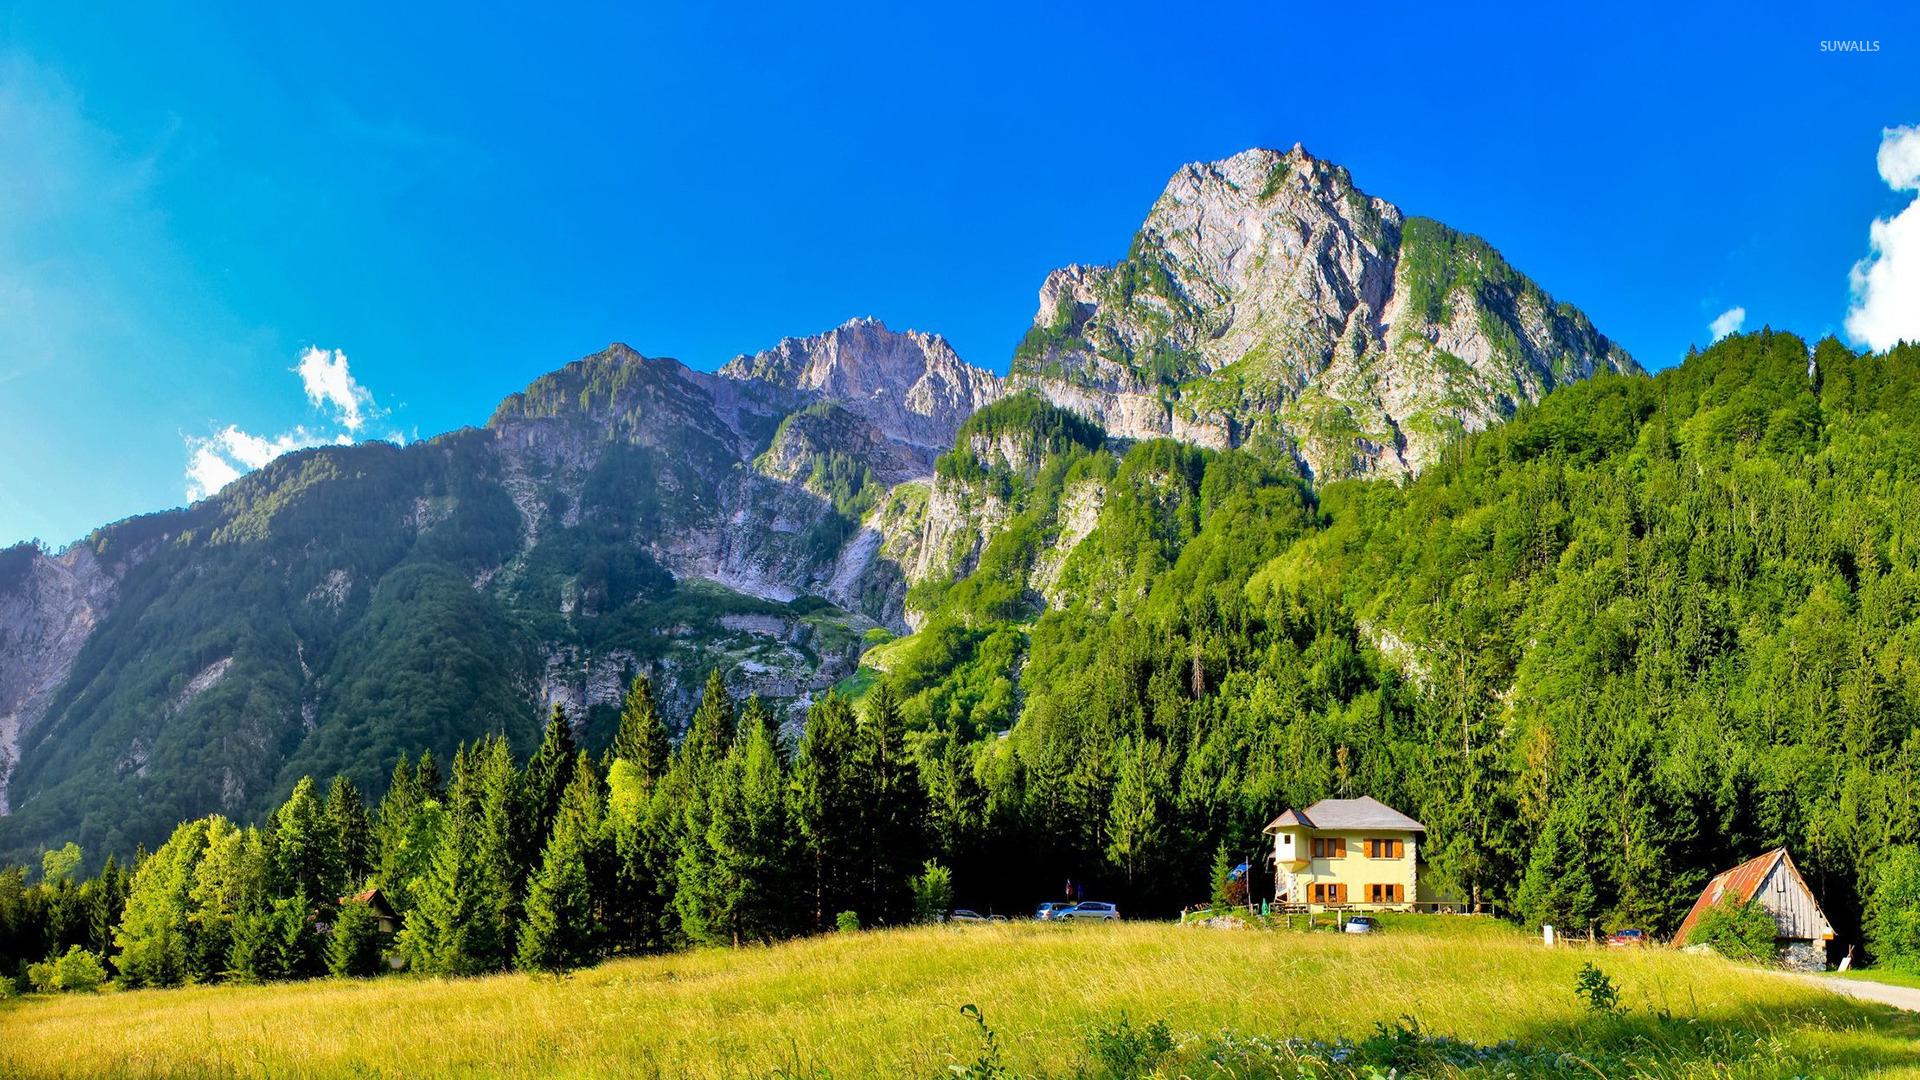 Free Fall Wallpaper 1920x1080 Slovenia Mountains Wallpaper Nature Wallpapers 33534